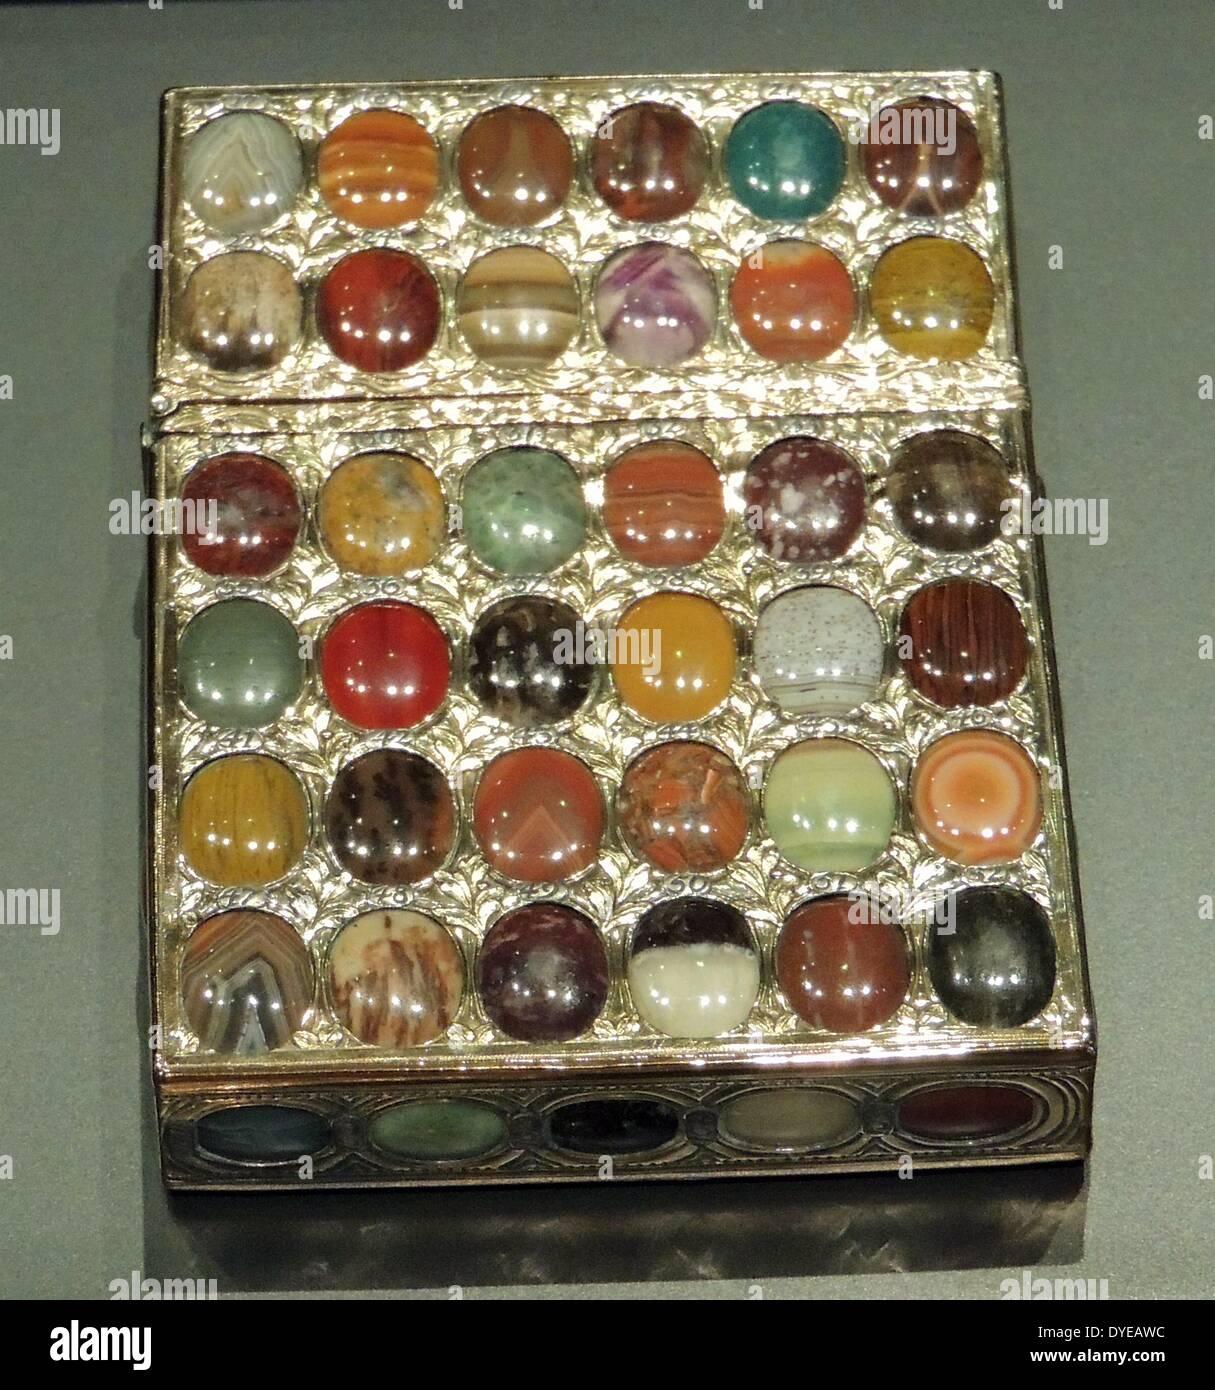 Historical Snuff Box Stockfotos & Historical Snuff Box Bilder - Alamy